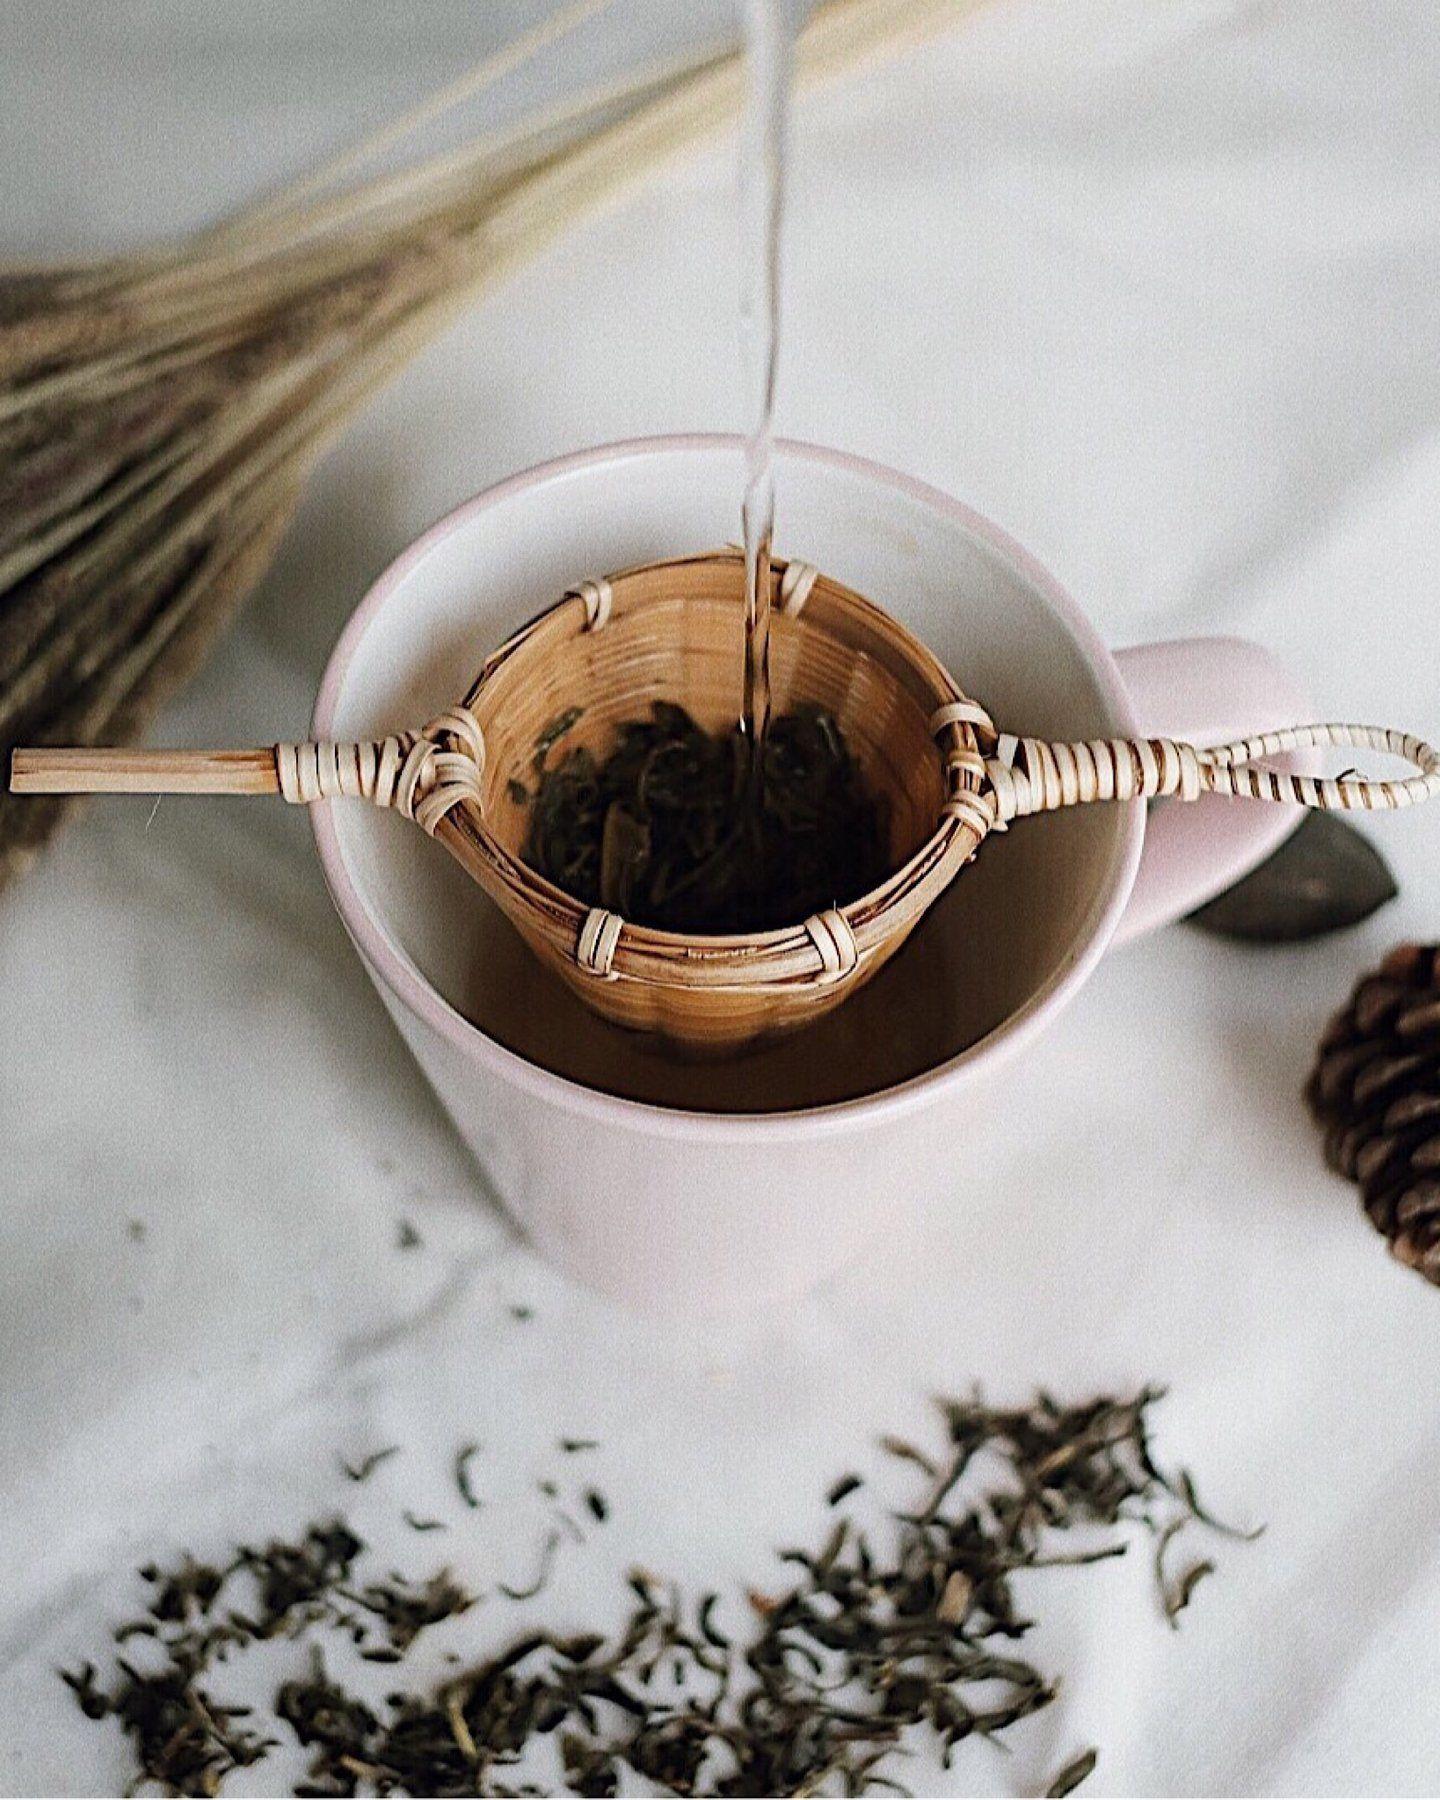 Bamboo Tea Strainer #teapackaging